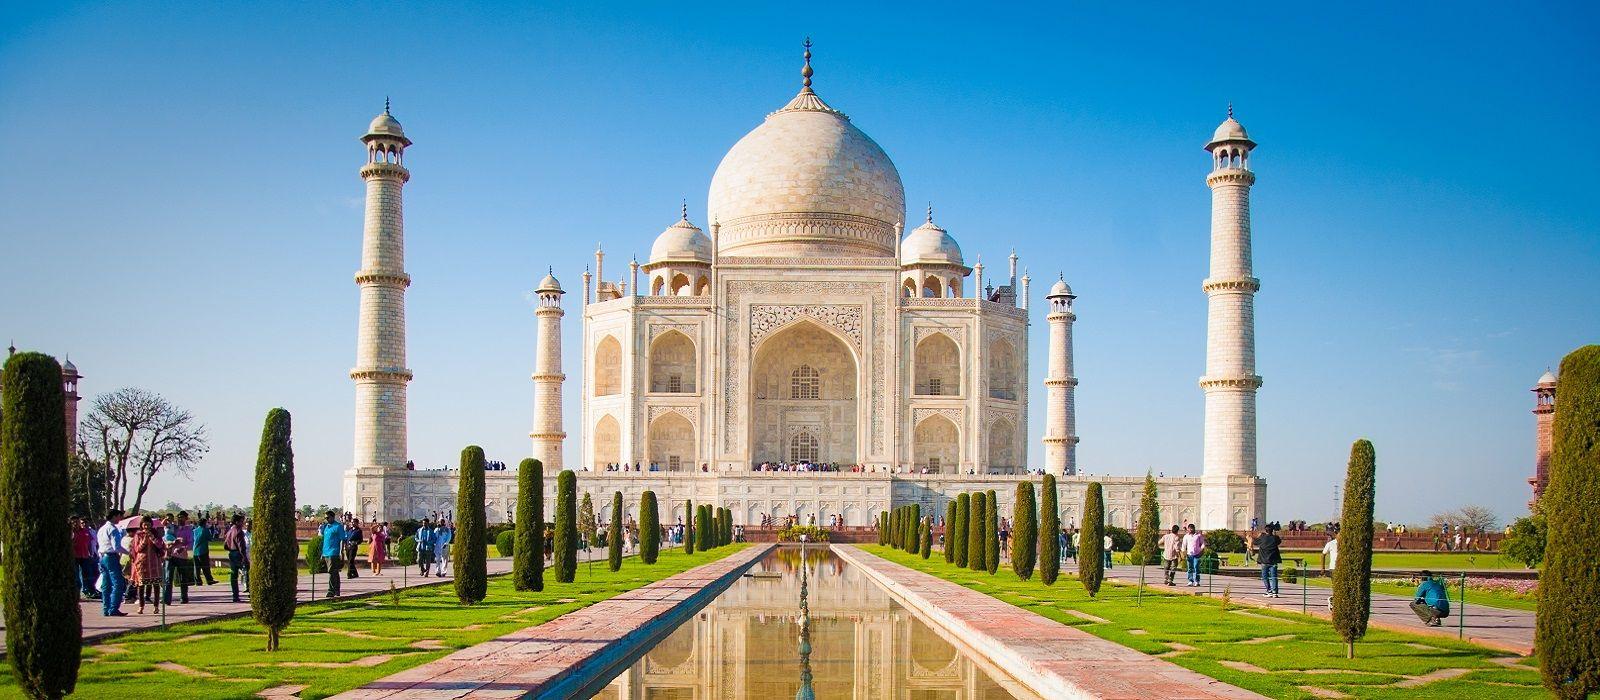 Oberoi Exklusiv: Royales Rajasthan und Safari Abenteuer Urlaub 1